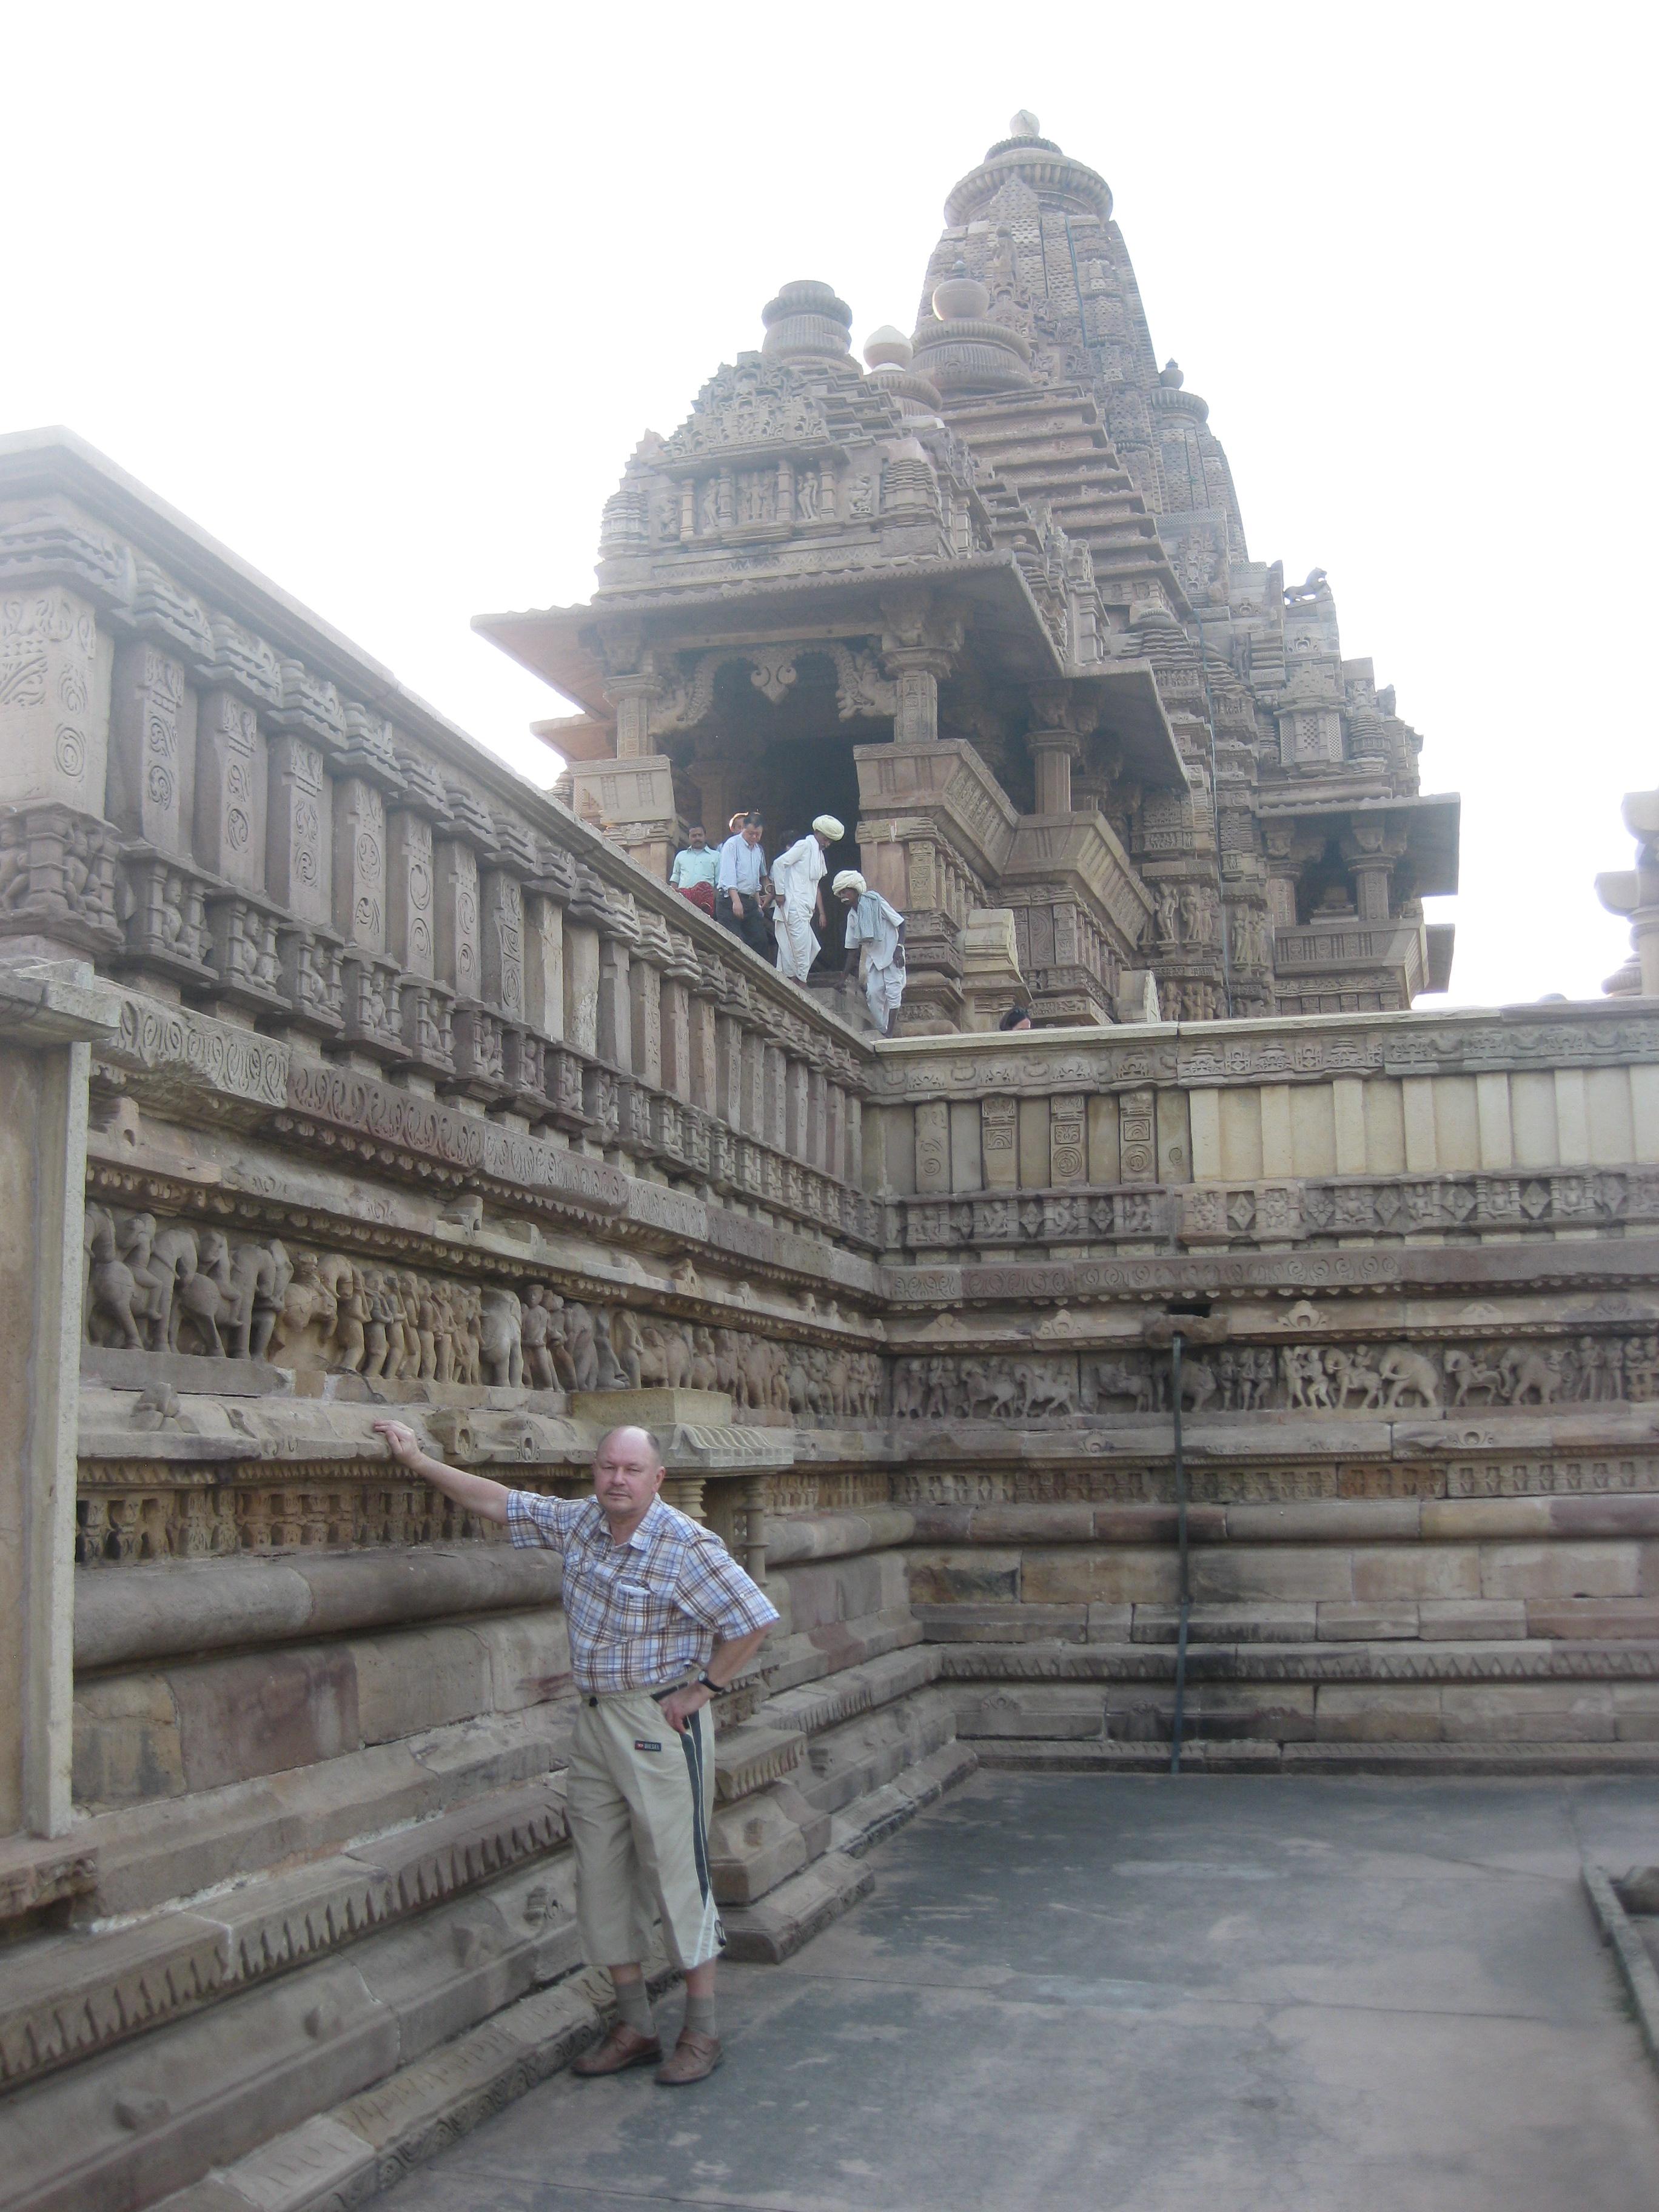 Храмы Каджурахо стоят на высоких плитах-фундаментах